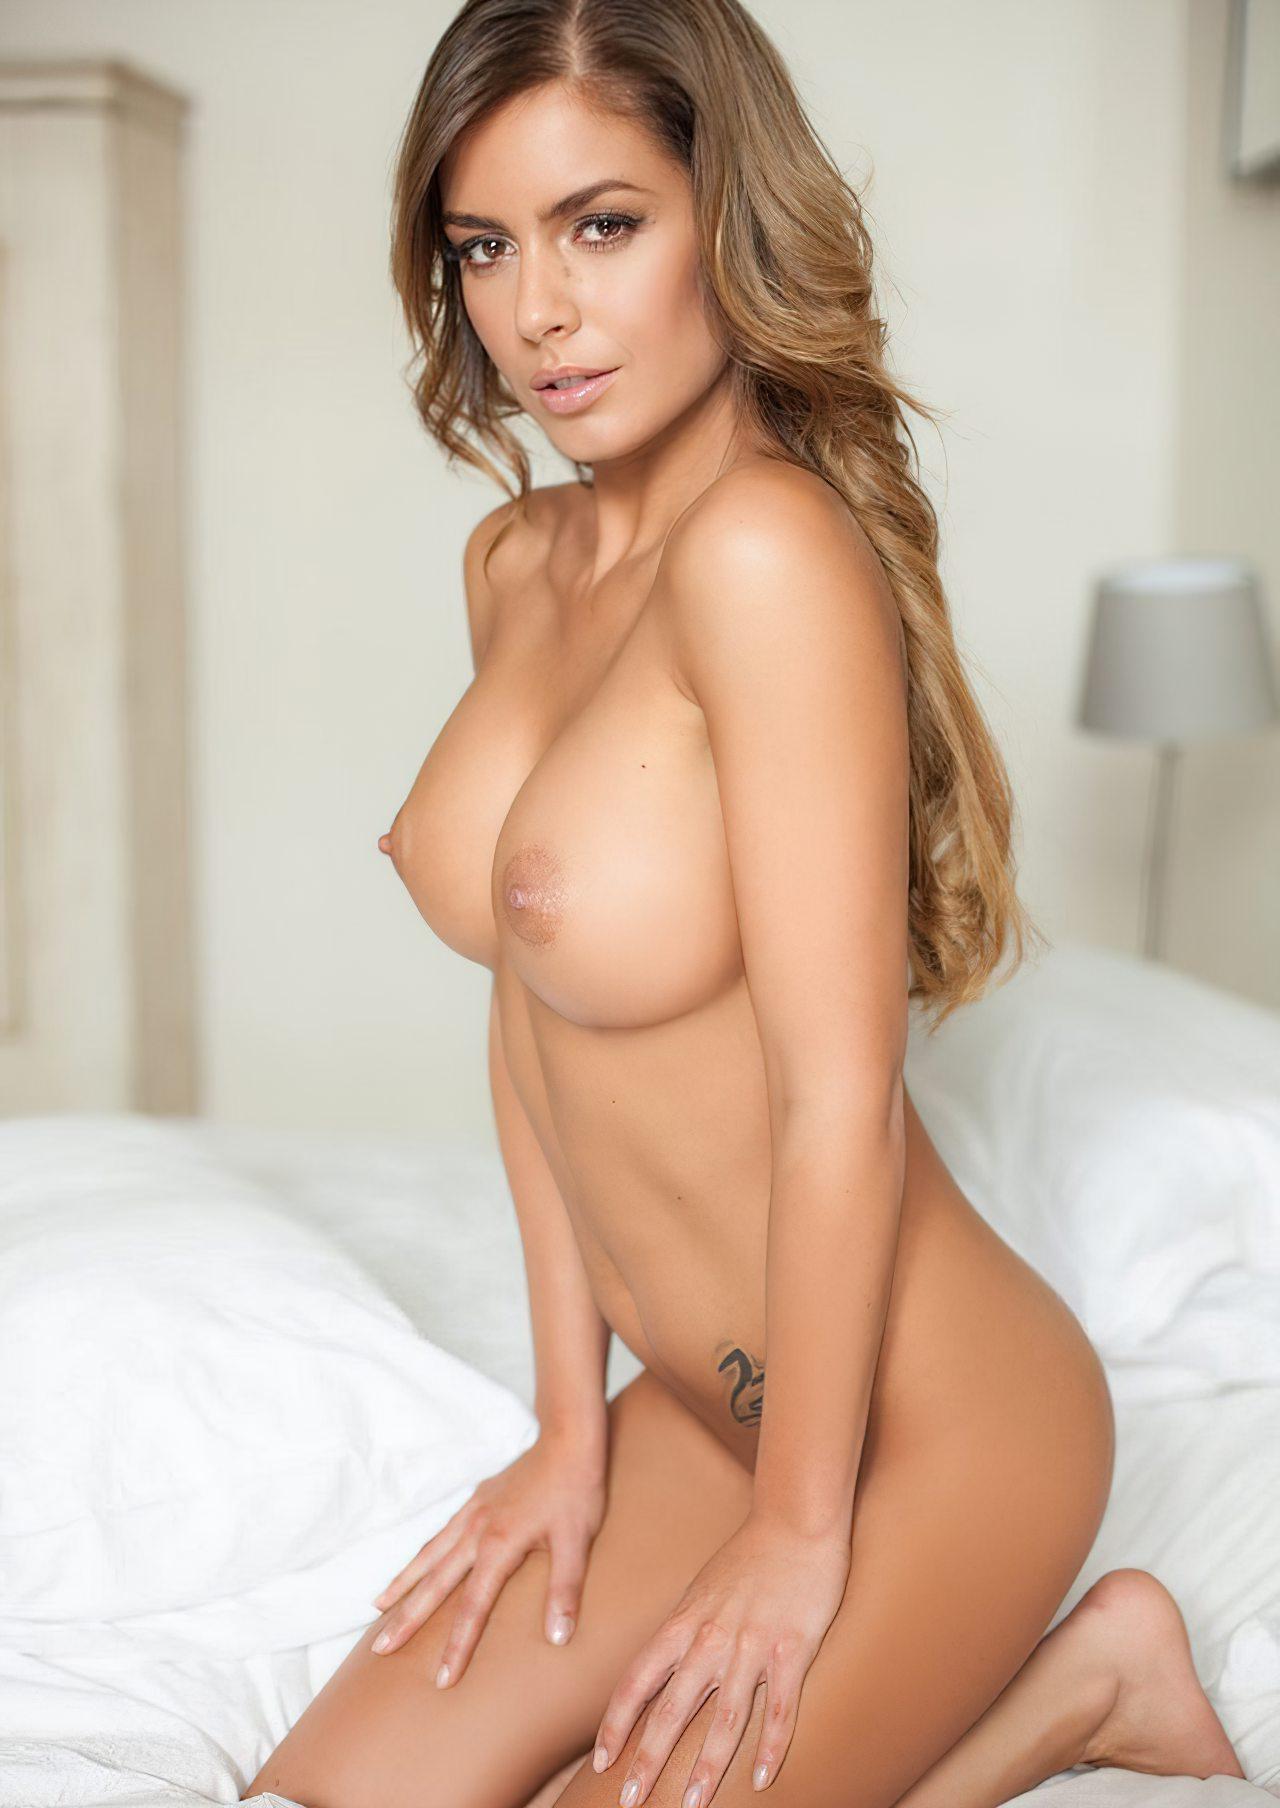 Mulheres Despidas Fotos (18)